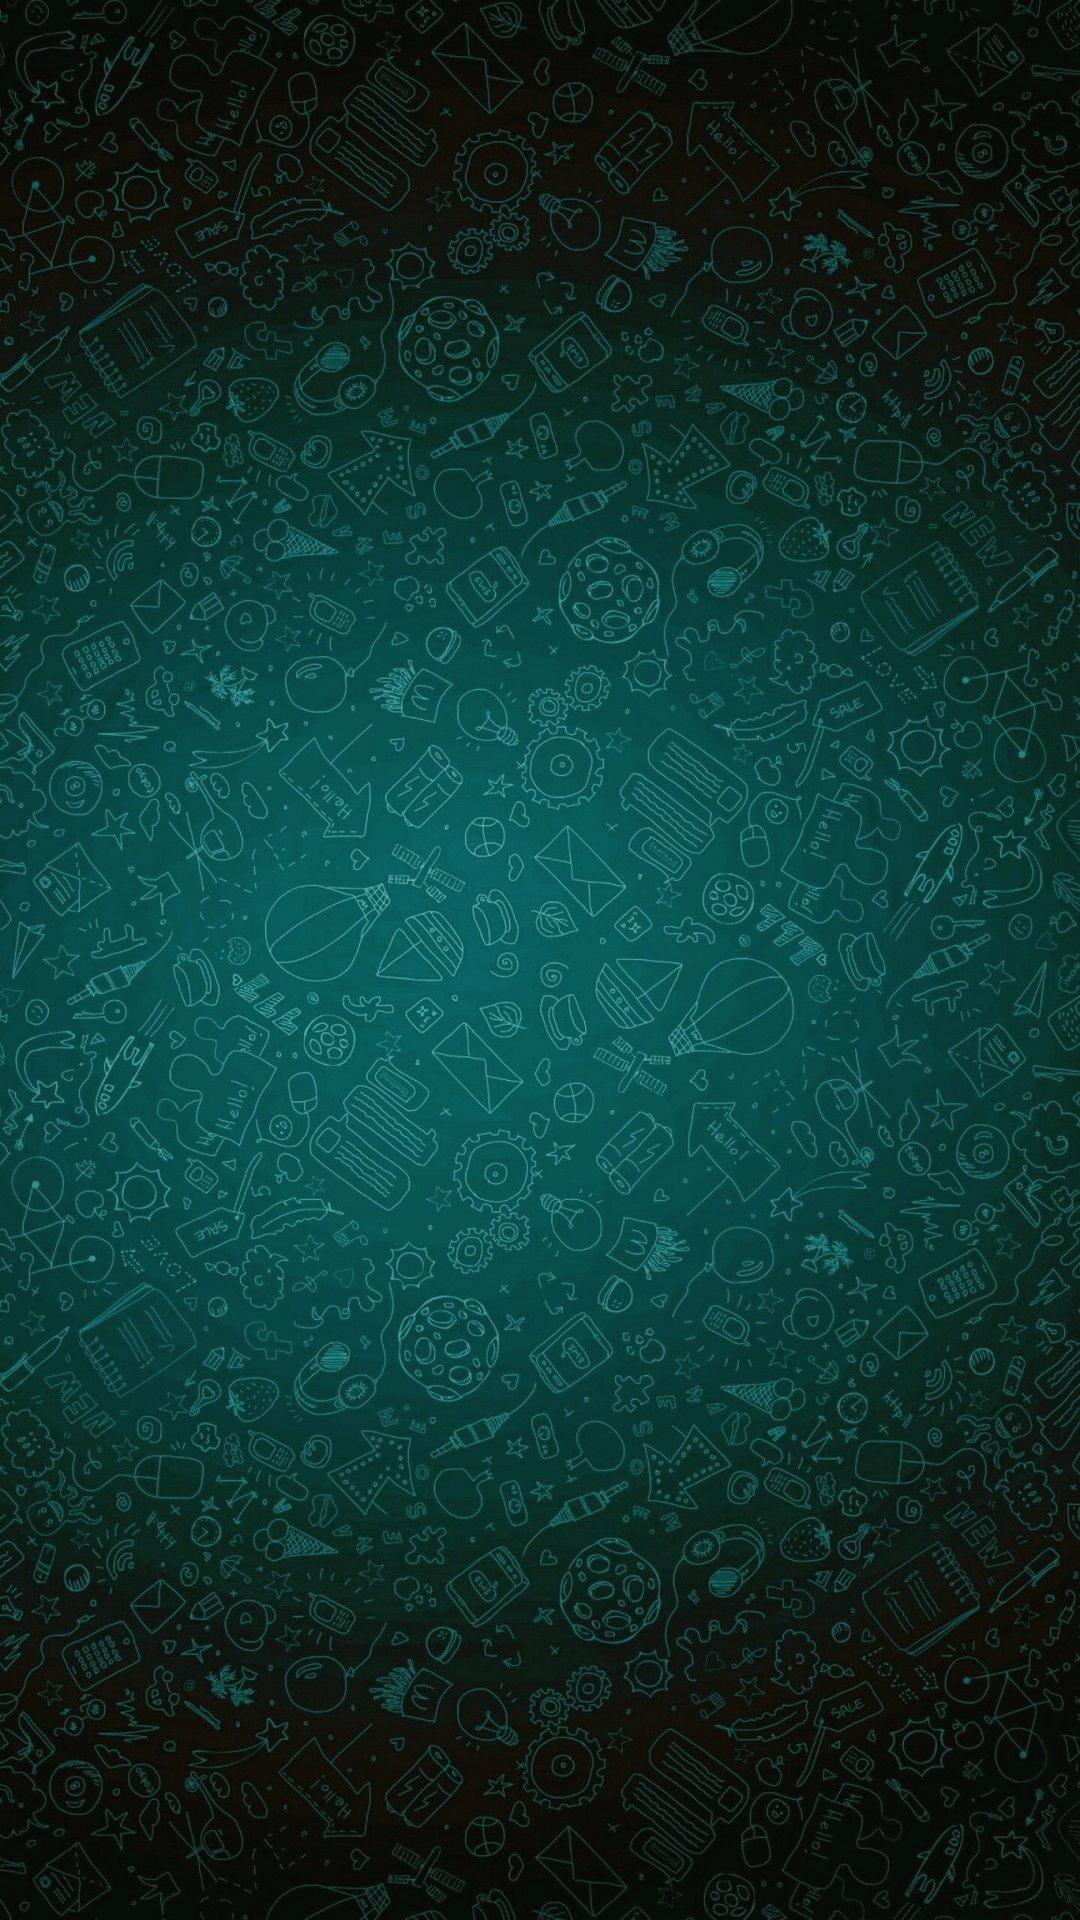 Whatsapp Background Cool Wallpaper Wallpaper Backgrounds - Whatsapp Background Wallpaper Hd , HD Wallpaper & Backgrounds